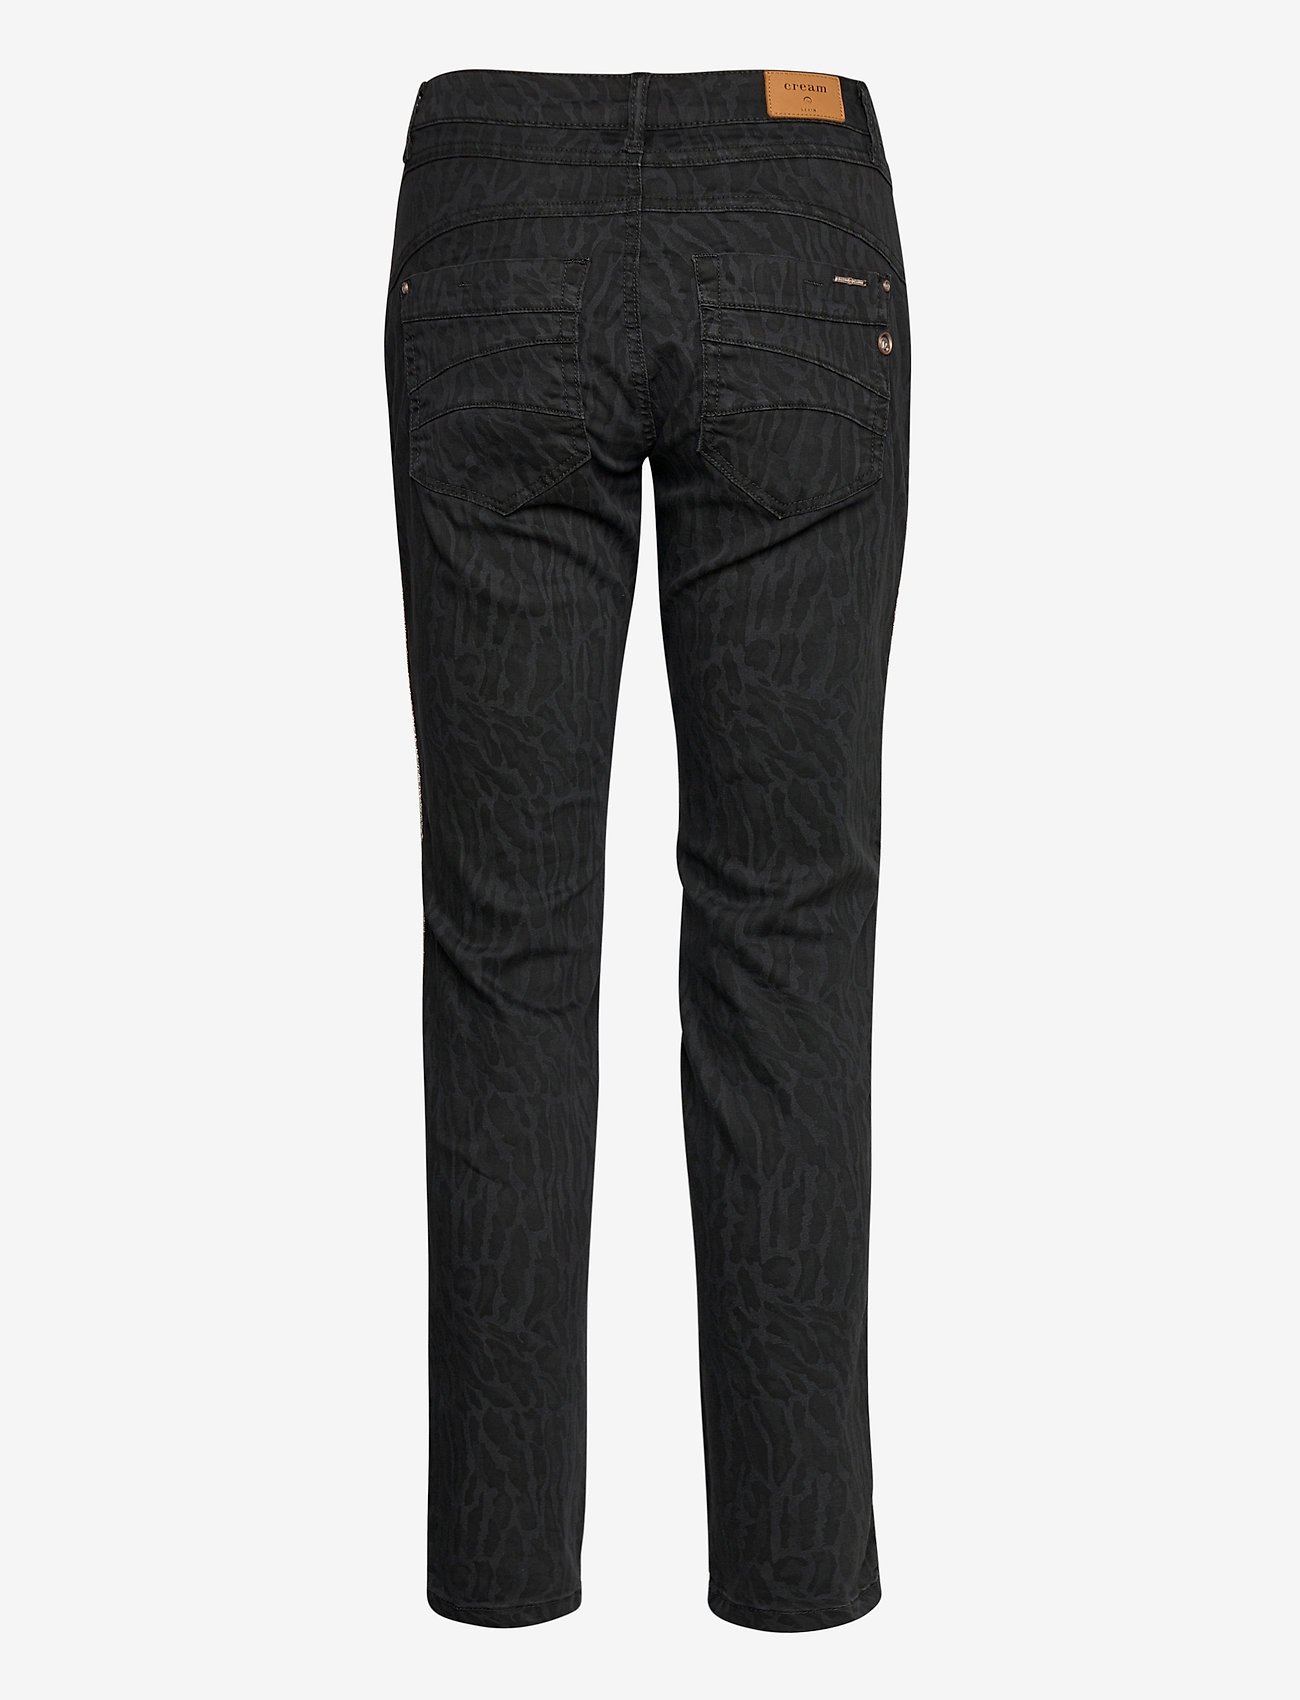 Cream - LotteCR Printed Twill Pants - Coco - slim jeans - grey toned tiger - 1